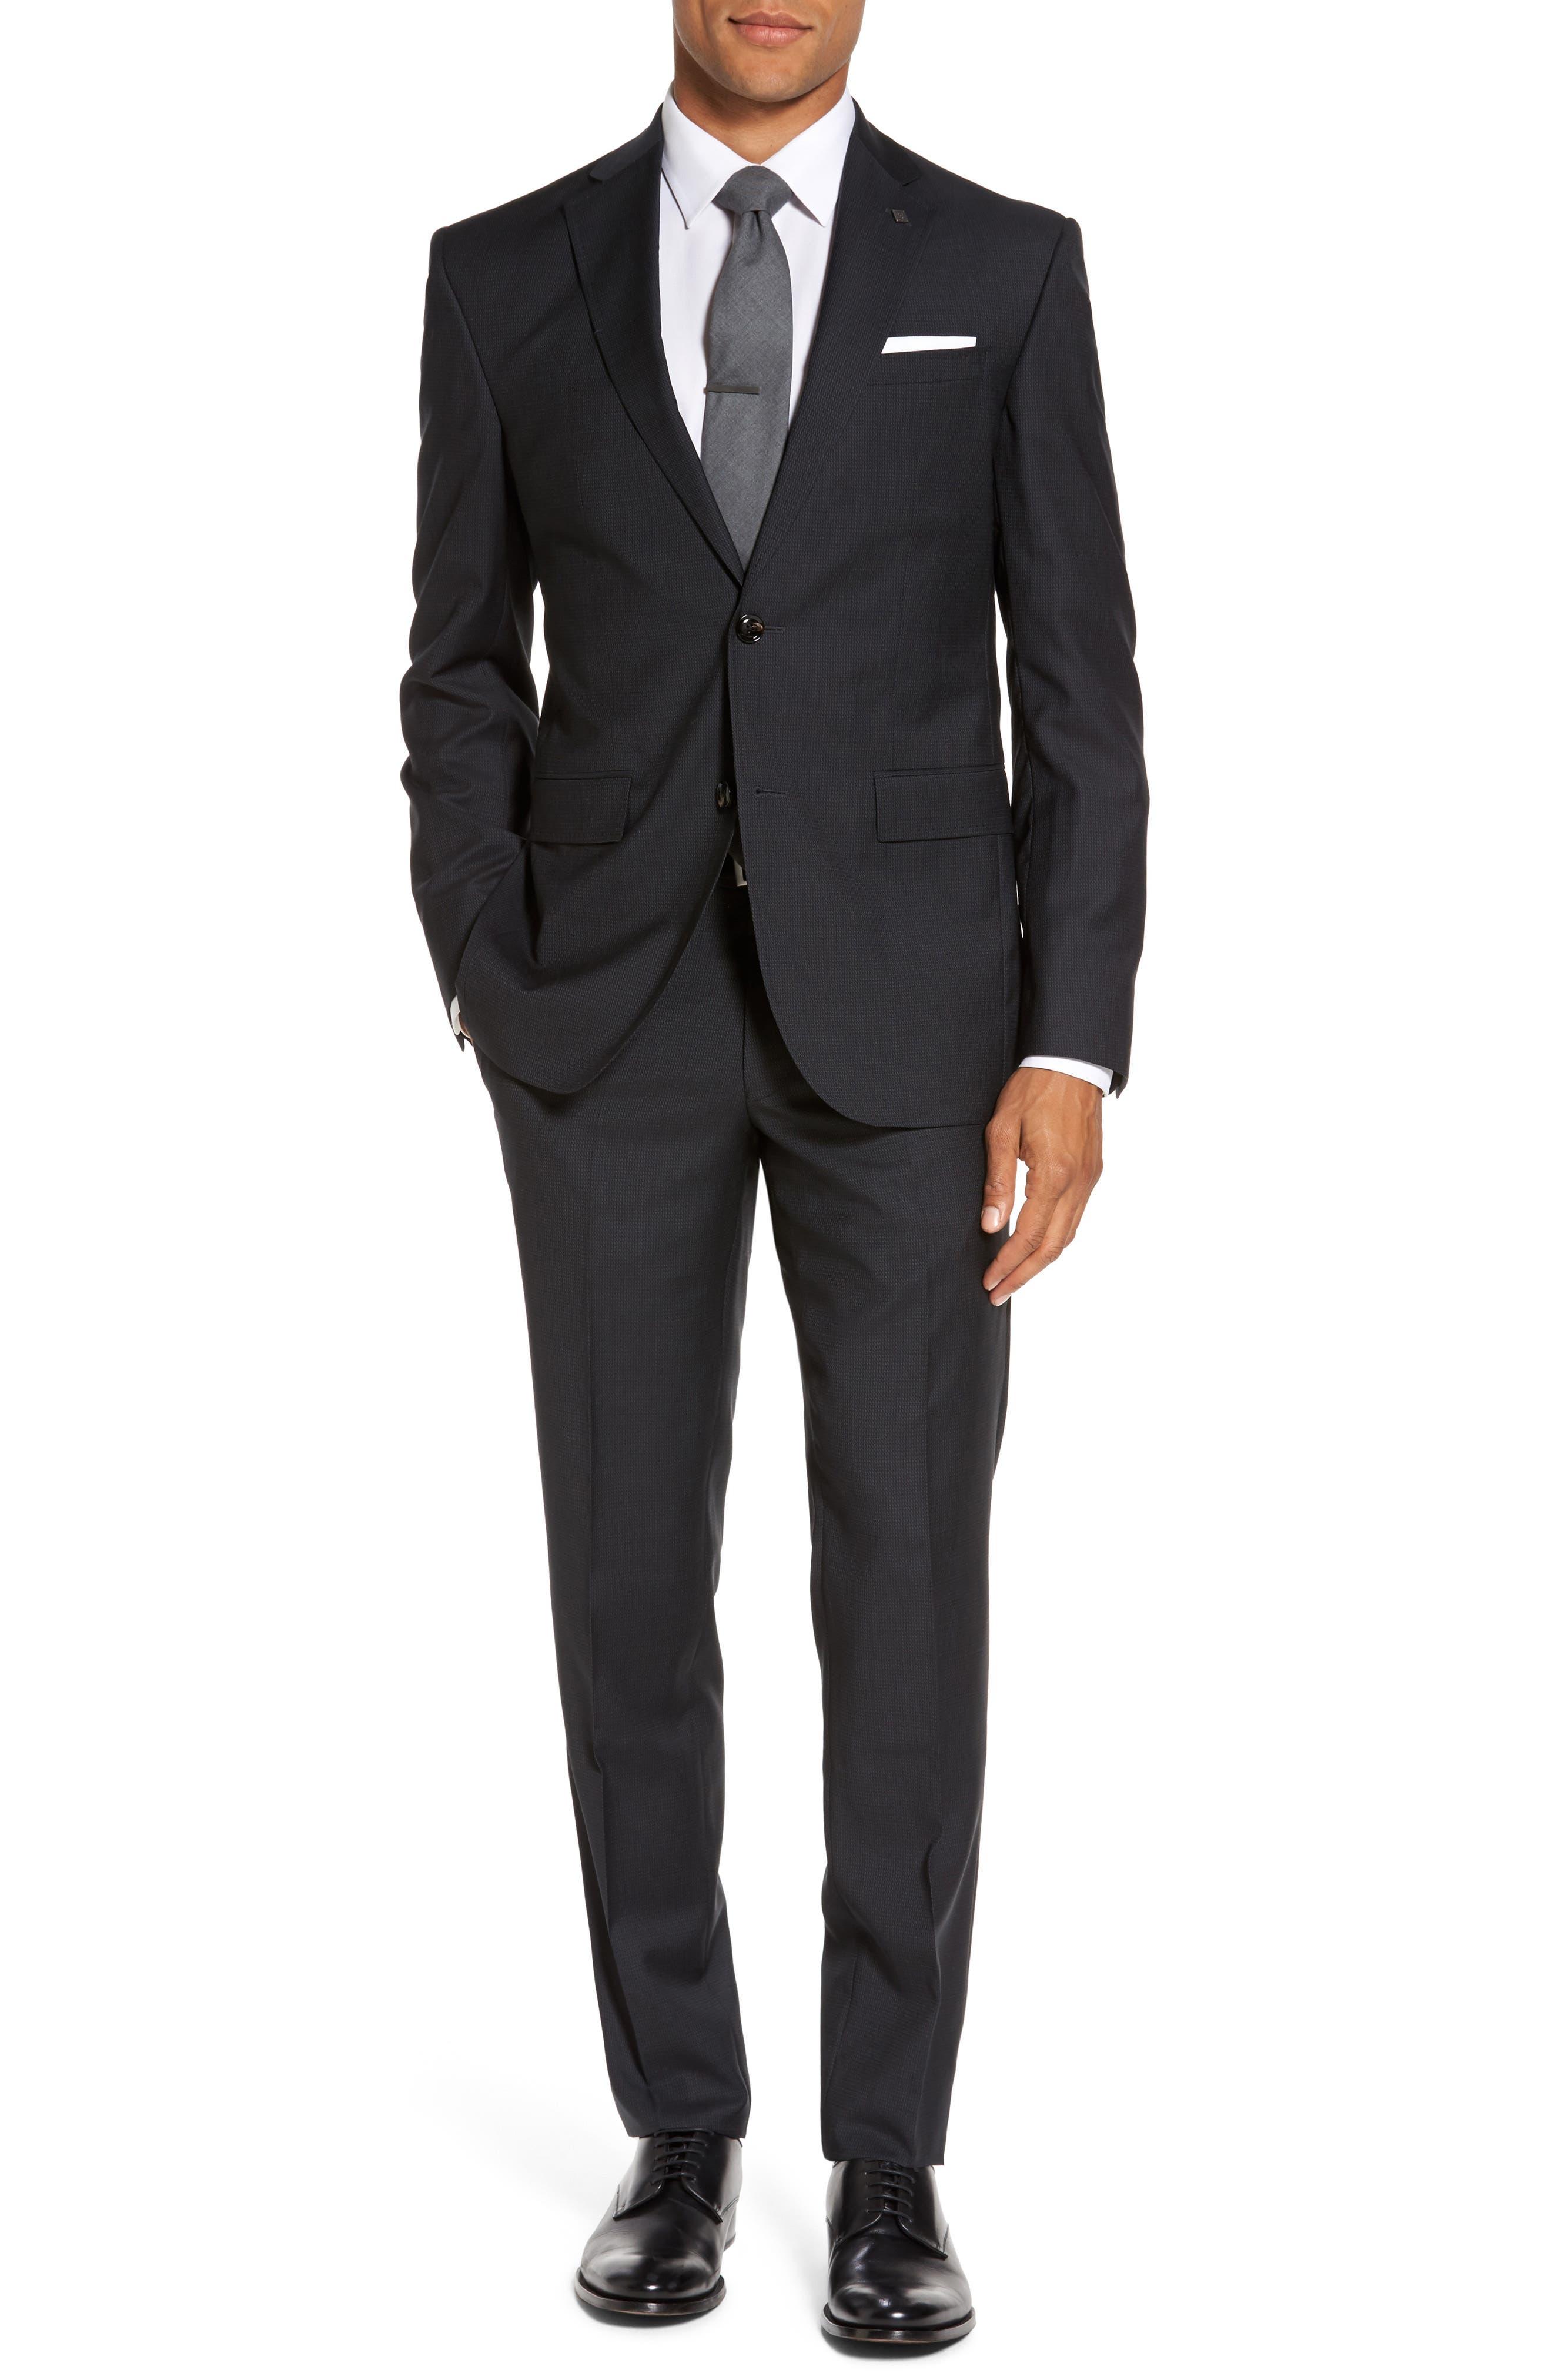 Roger Trim Fit Solid Wool Suit,                         Main,                         color, Black Charcoal